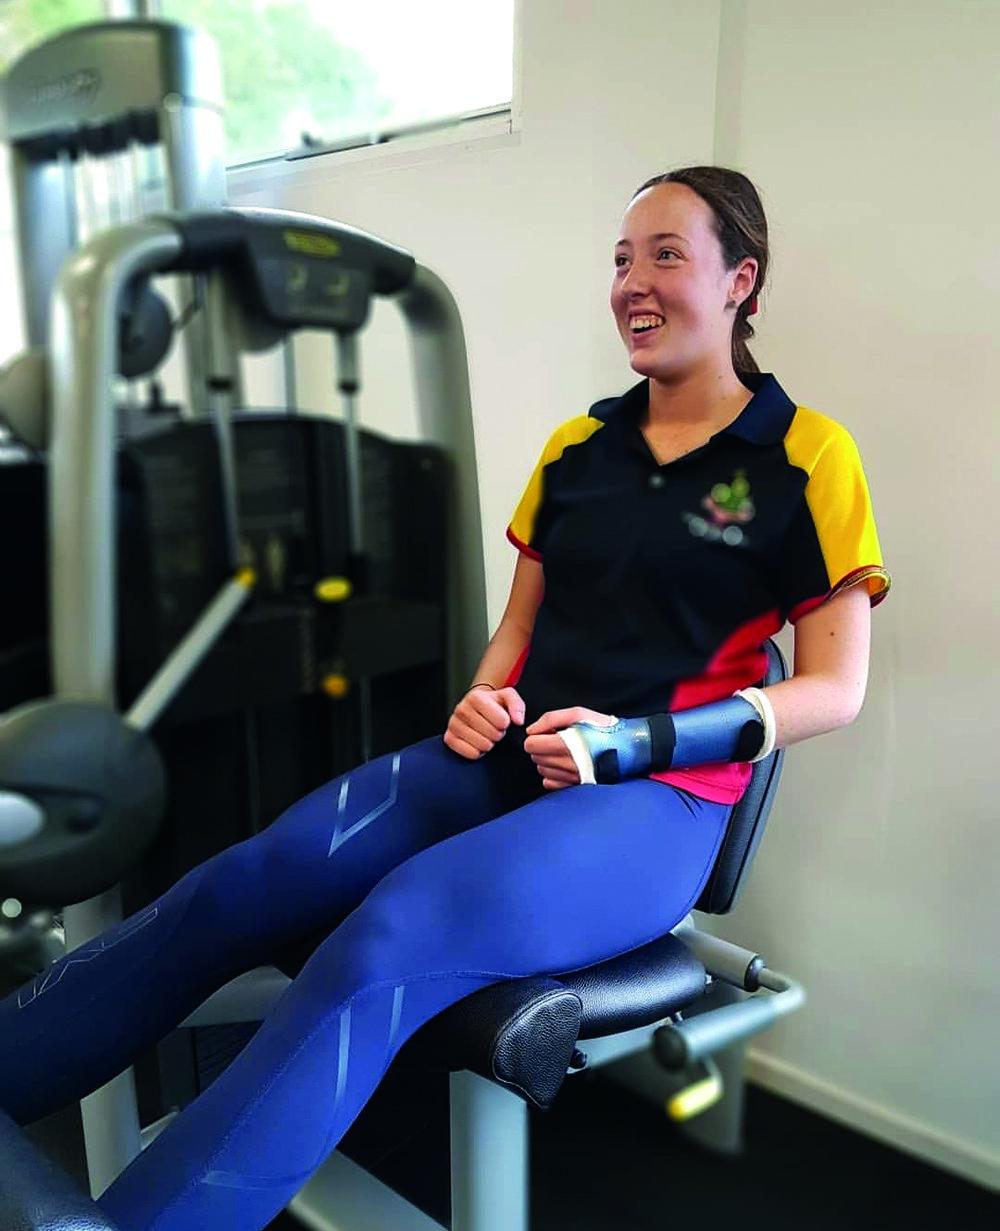 Injured person training.jpg